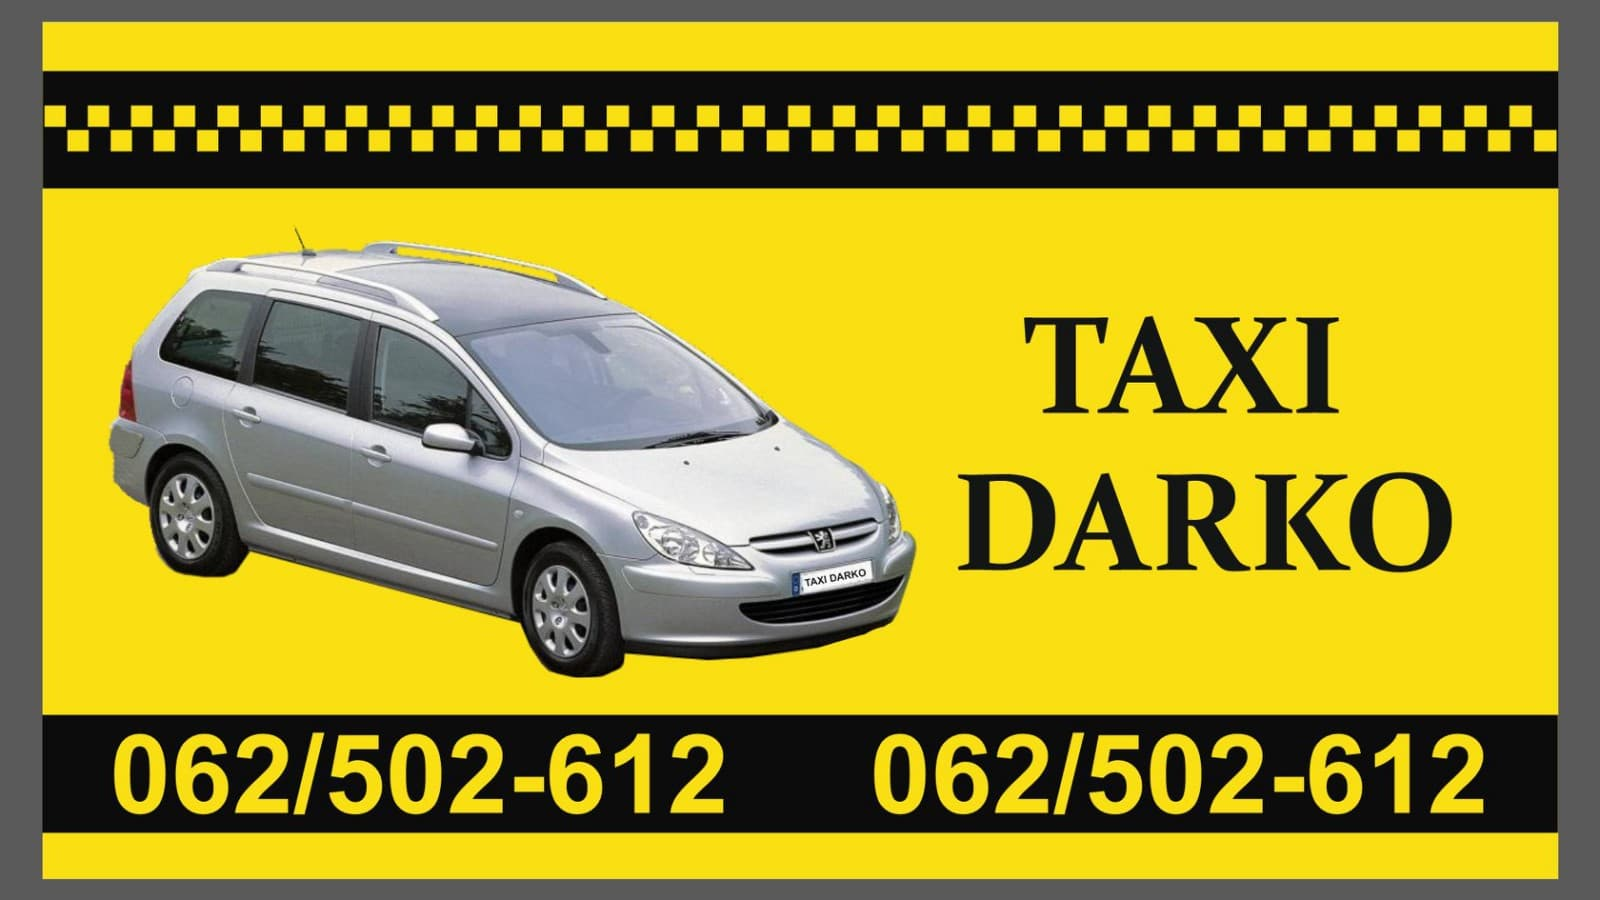 Taxi Darko